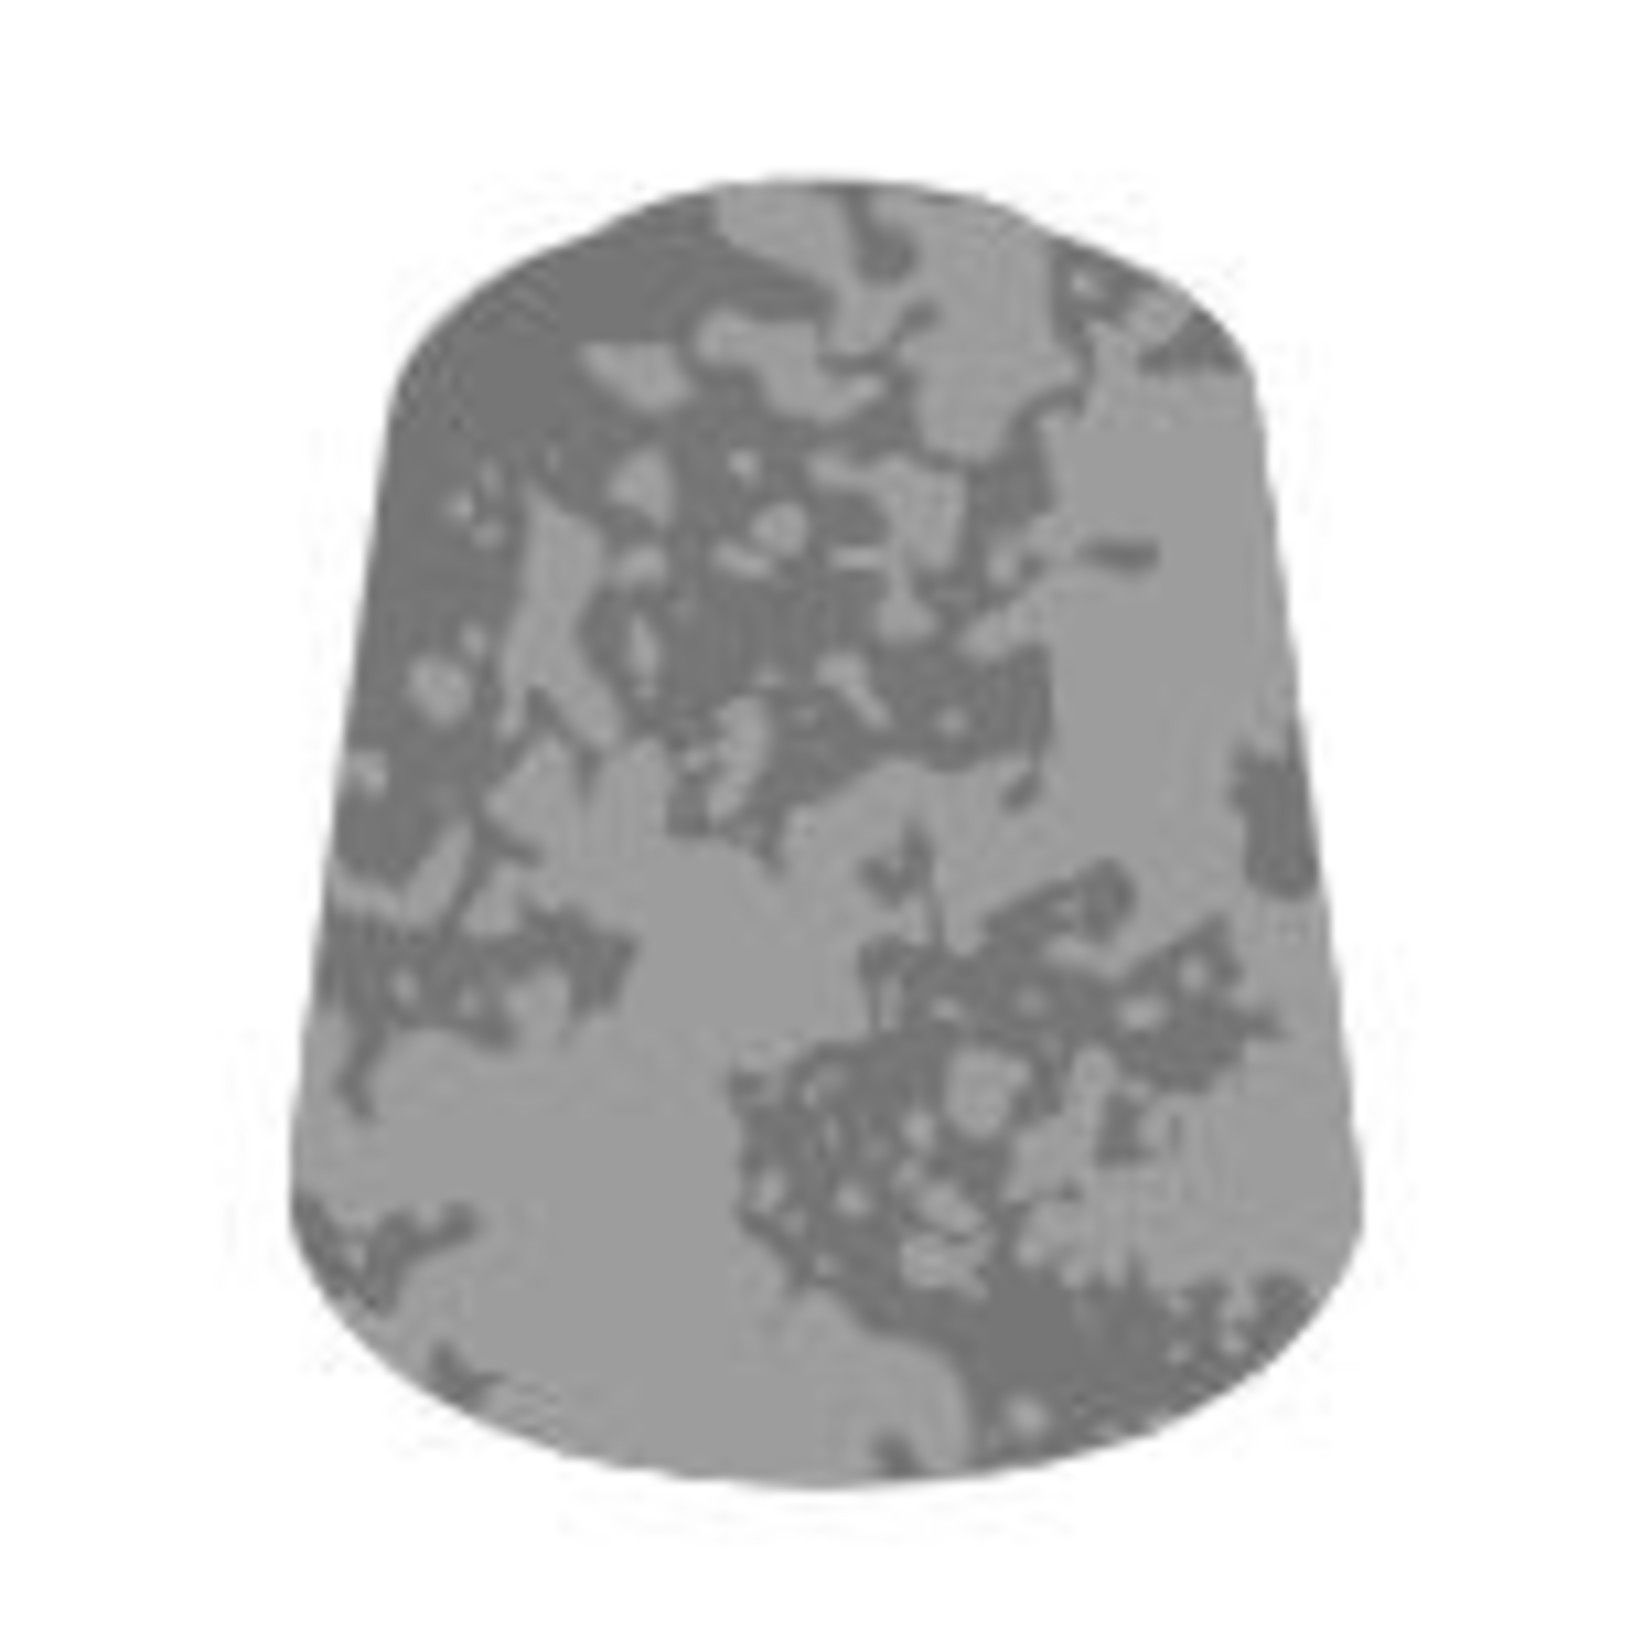 Games Workshop Astrogranite Debris (24ml) Technical